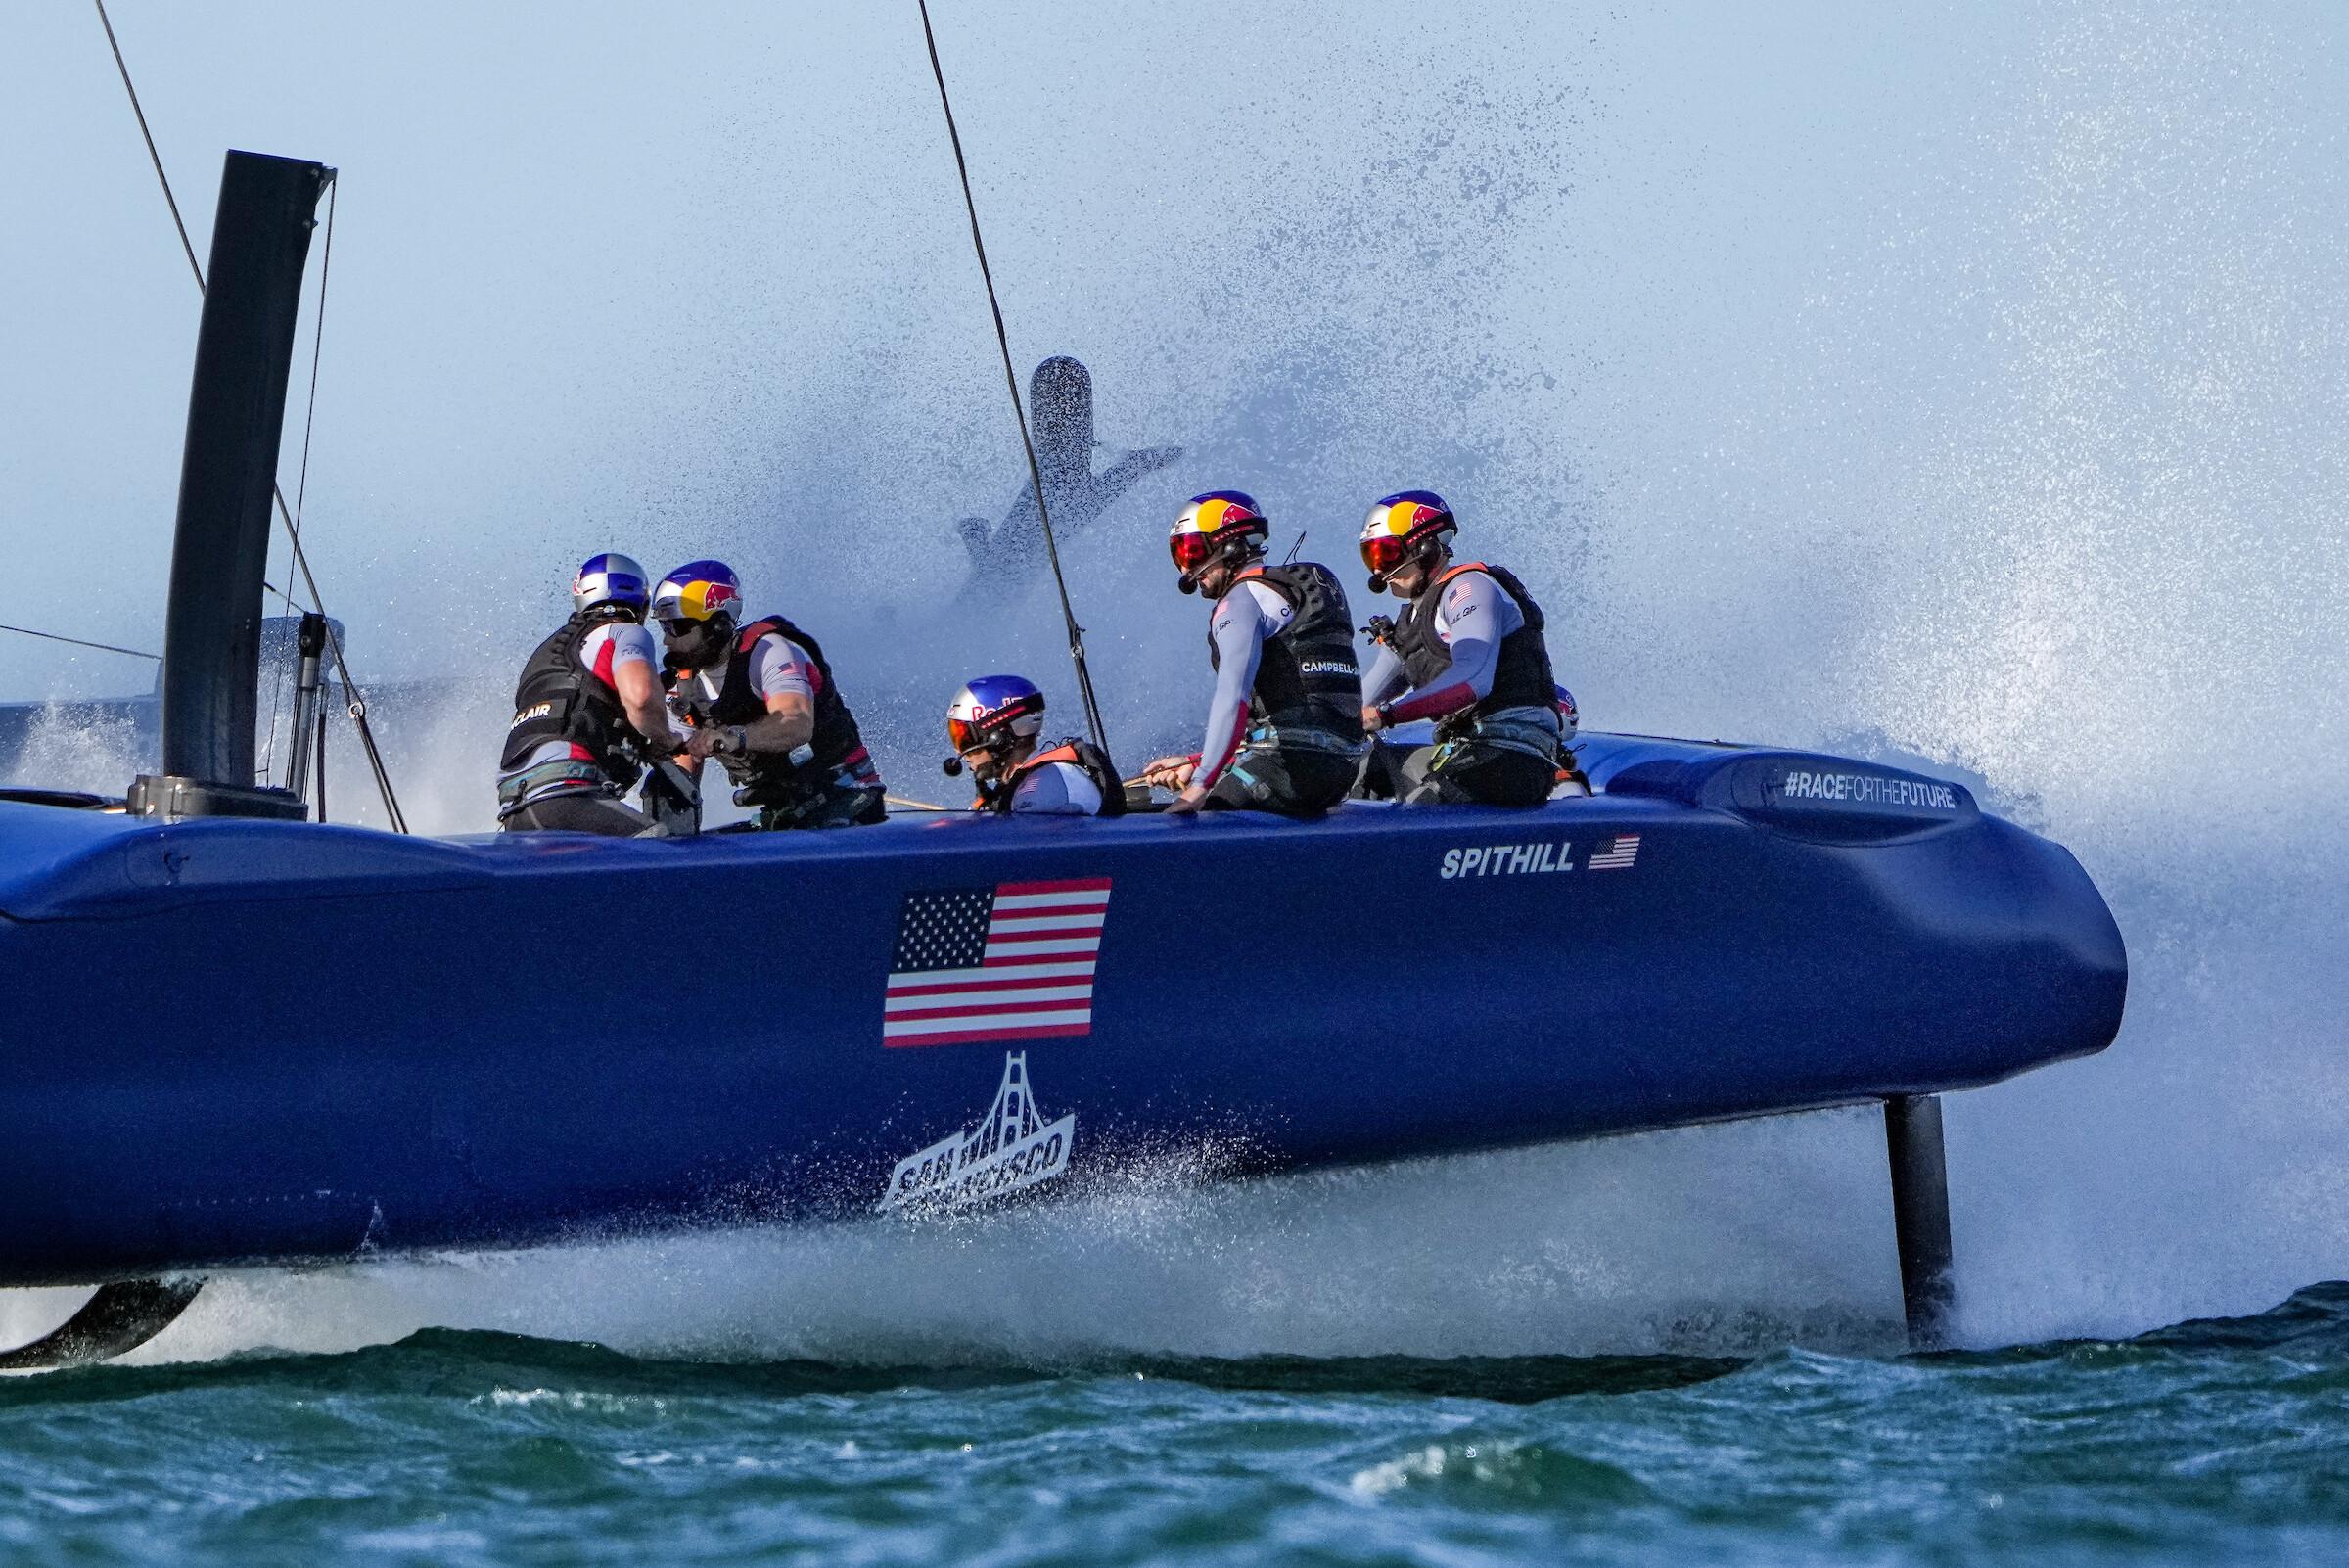 Team USA sailing, creating wash